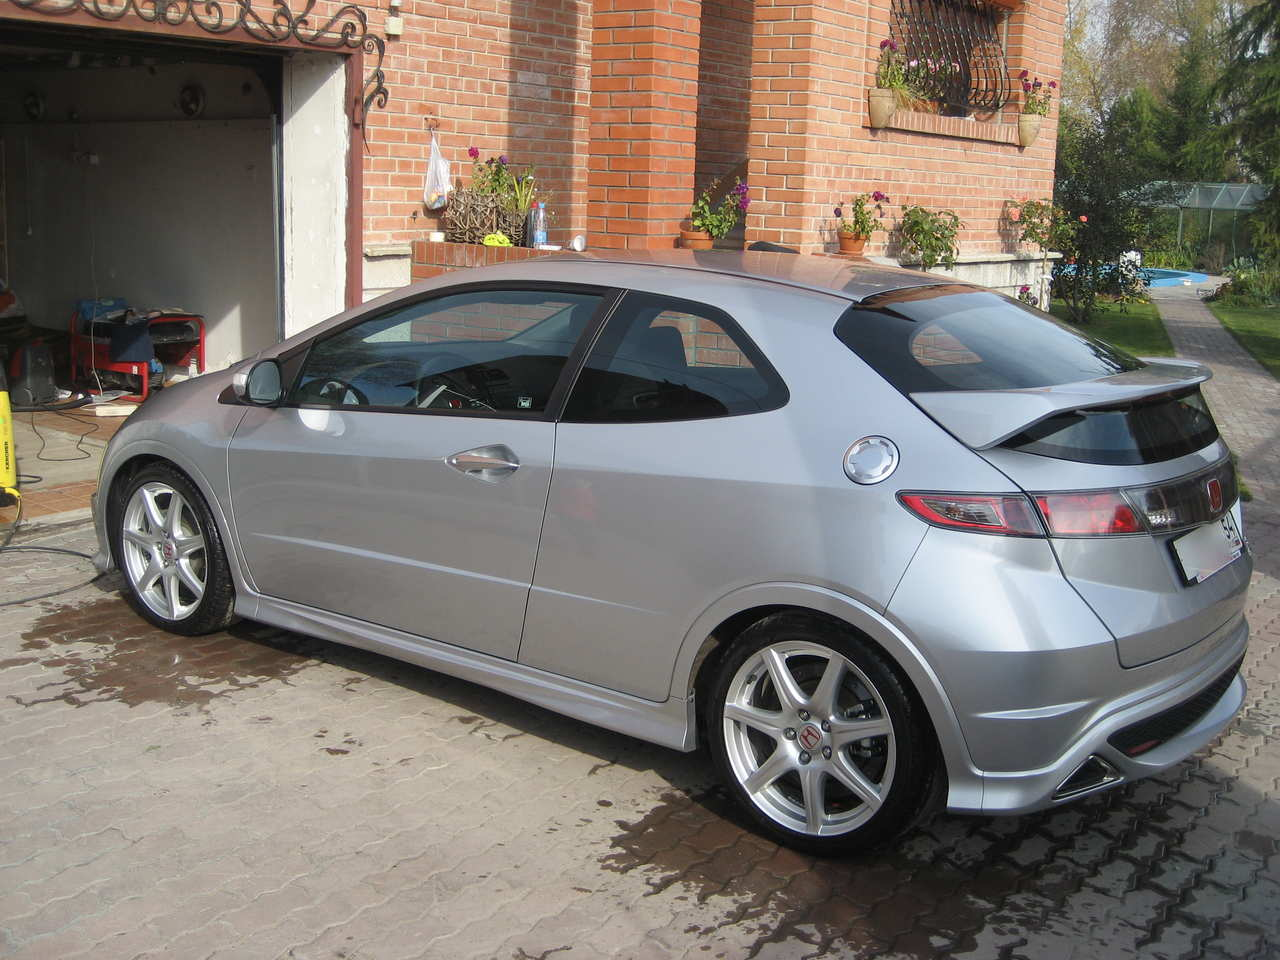 2008 honda civic type r pictures  2 0l   gasoline  ff  manual for sale 2008 honda civic manual transmission problems 2008 honda civic manual for sale